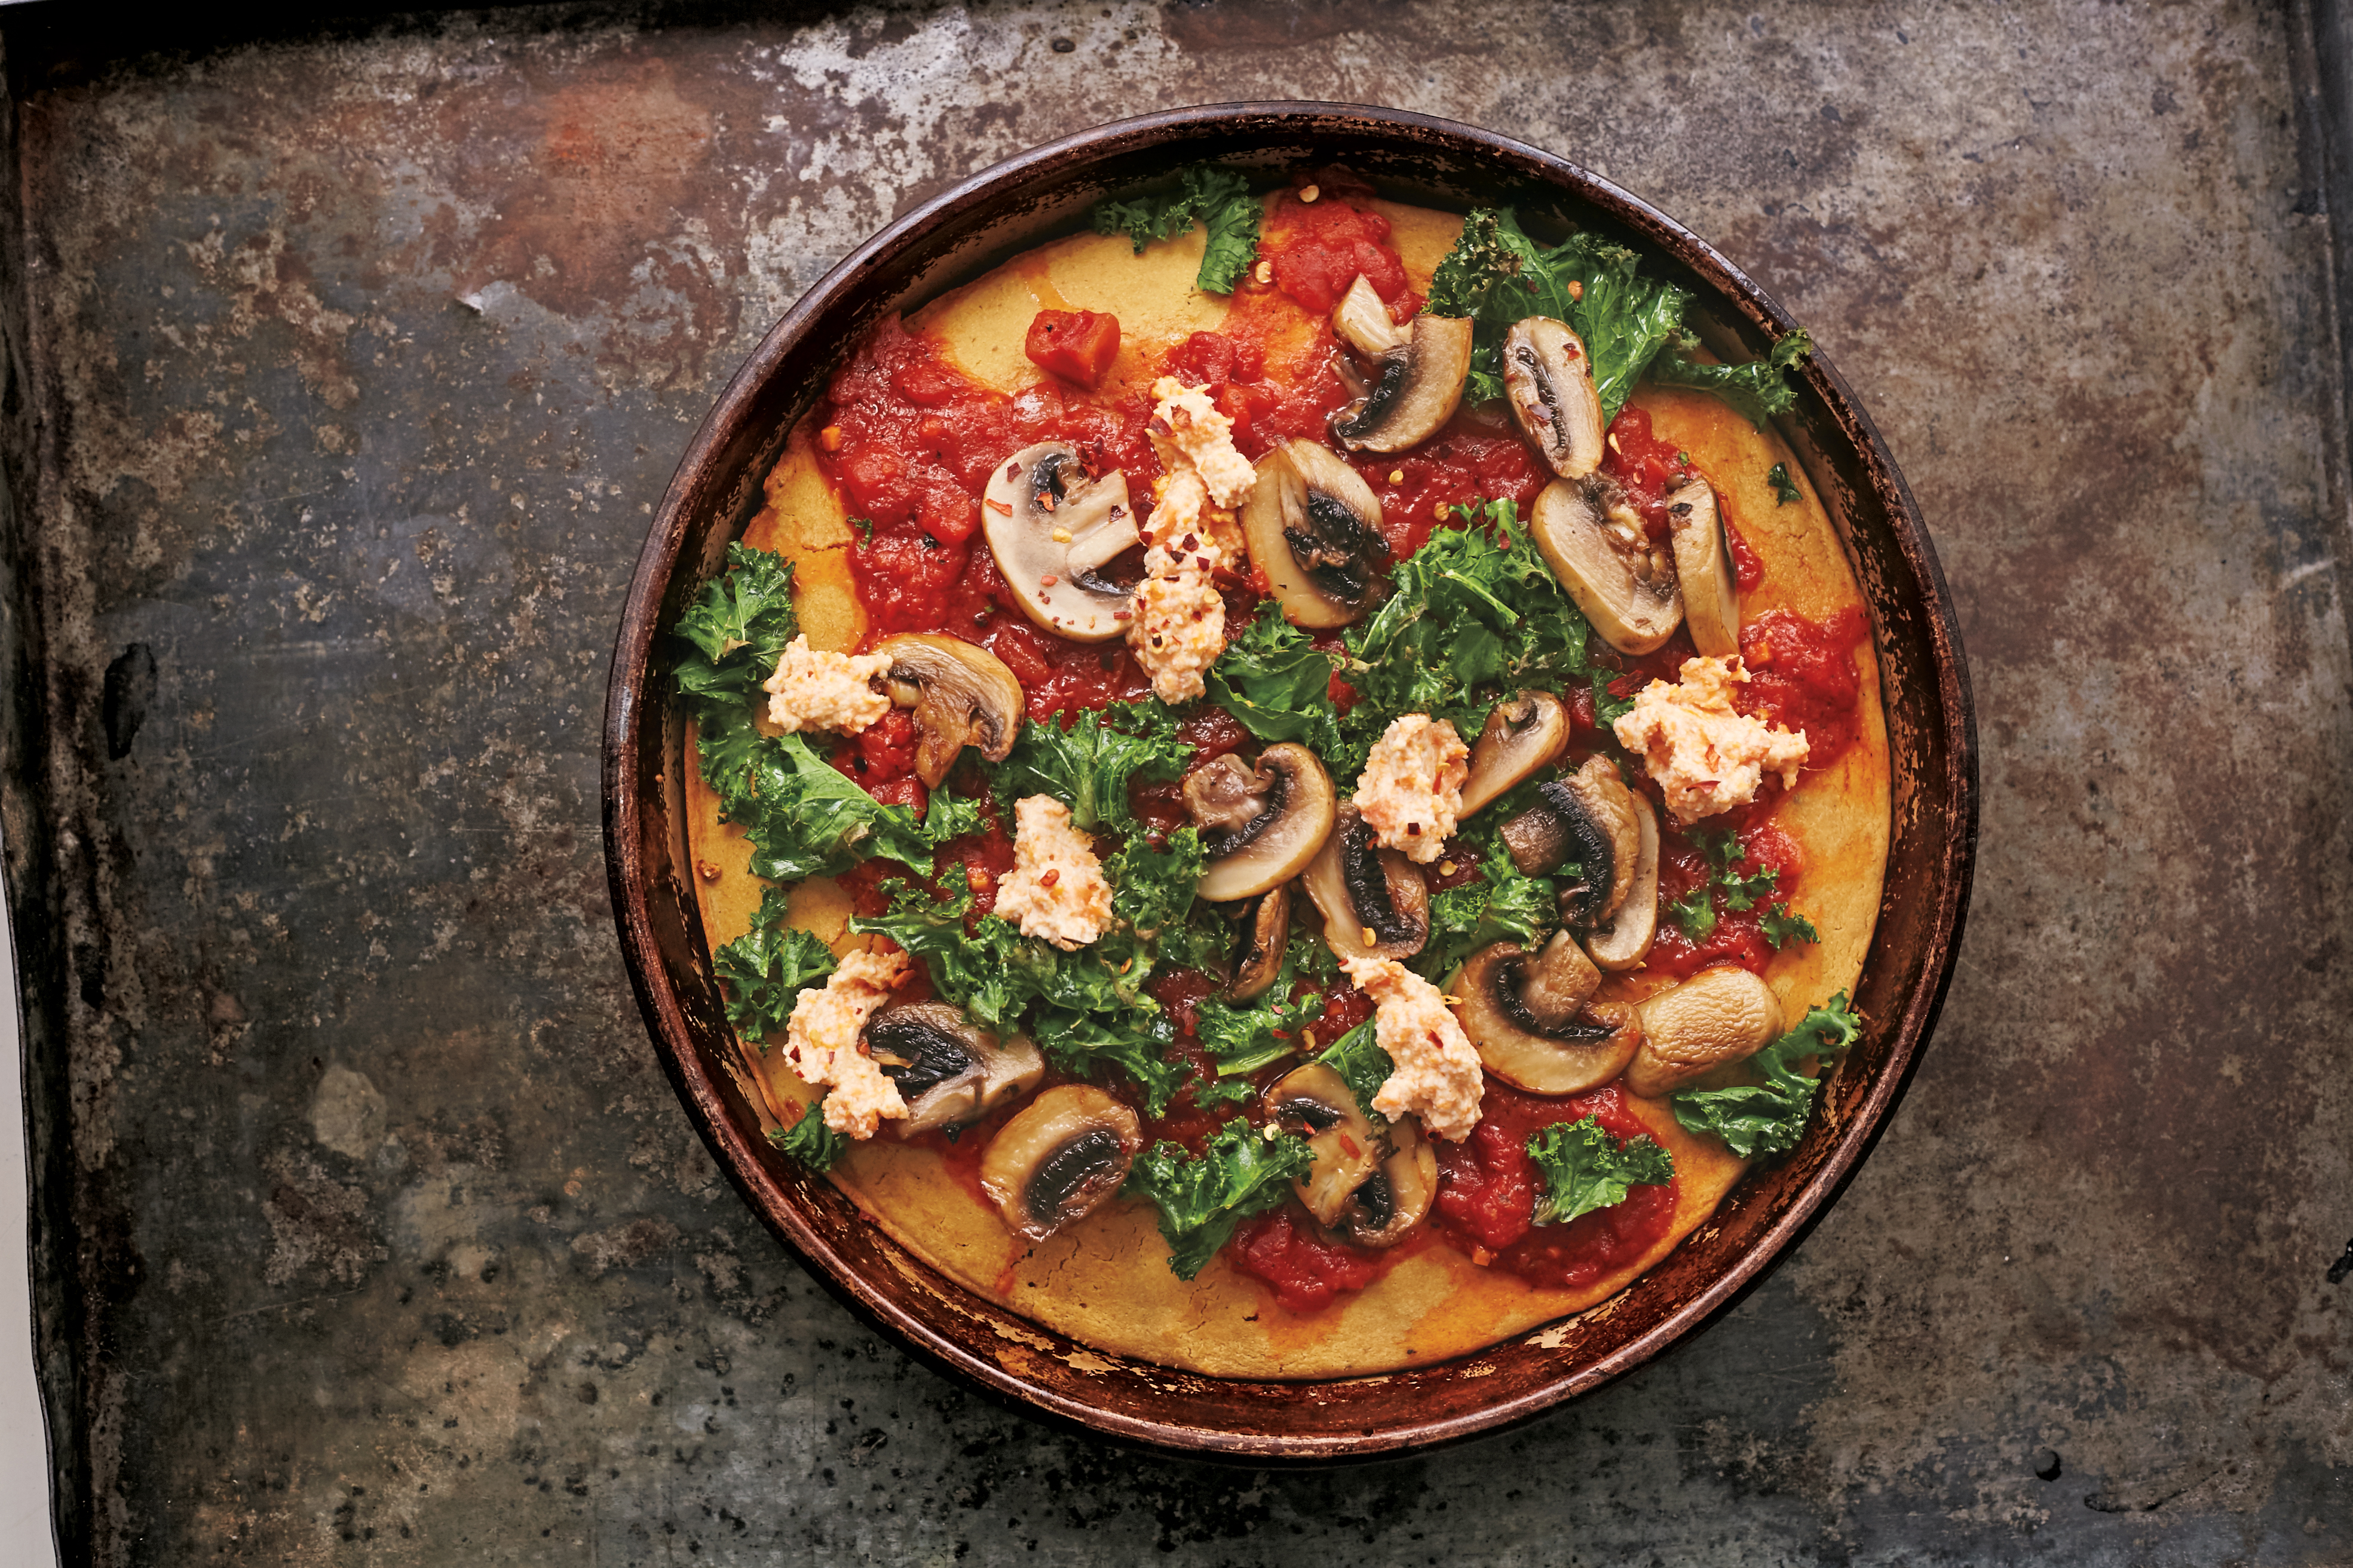 Moroccan Chickpea Skillet Pizza - Gluten-Free Living | 3938 x 2625 jpeg 7724kB